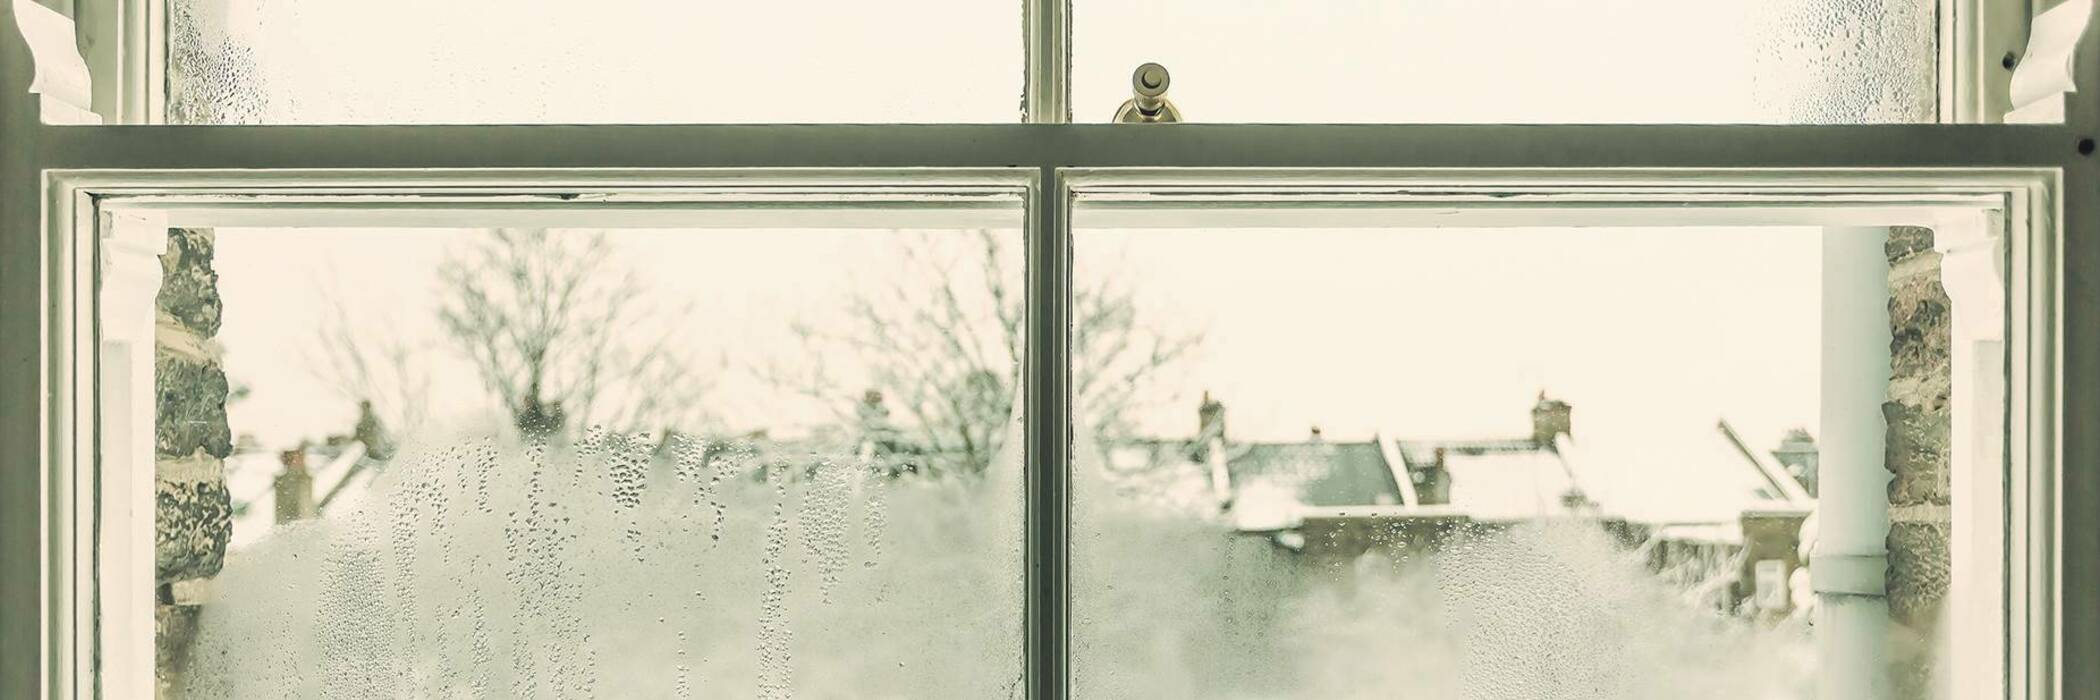 Home maintenance combating dampness herol